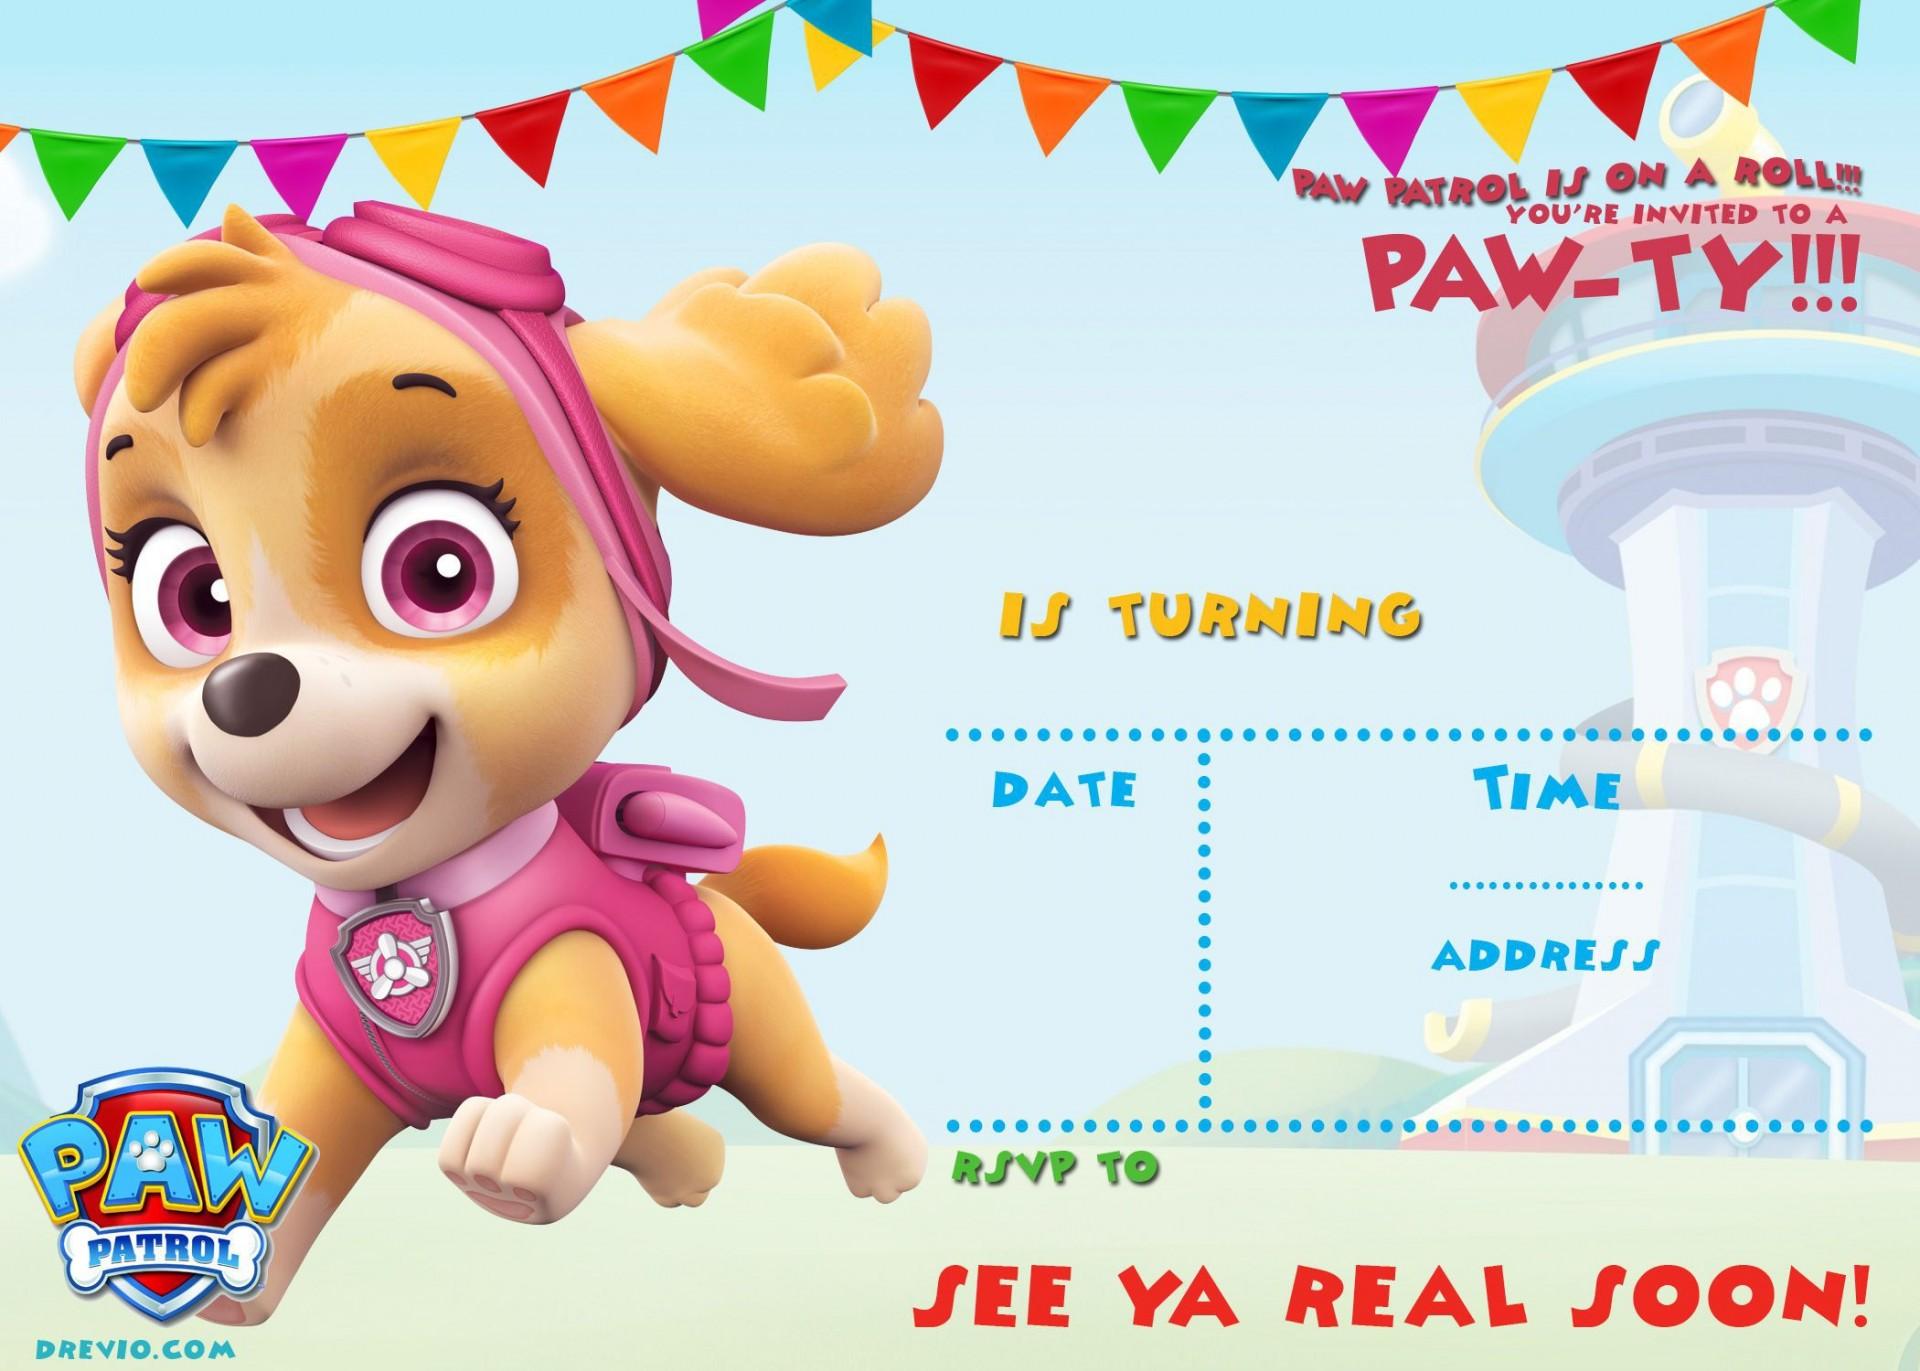 004 Singular Paw Patrol Birthday Invitation Template Highest Quality  Party Invite Wording Skye Free1920